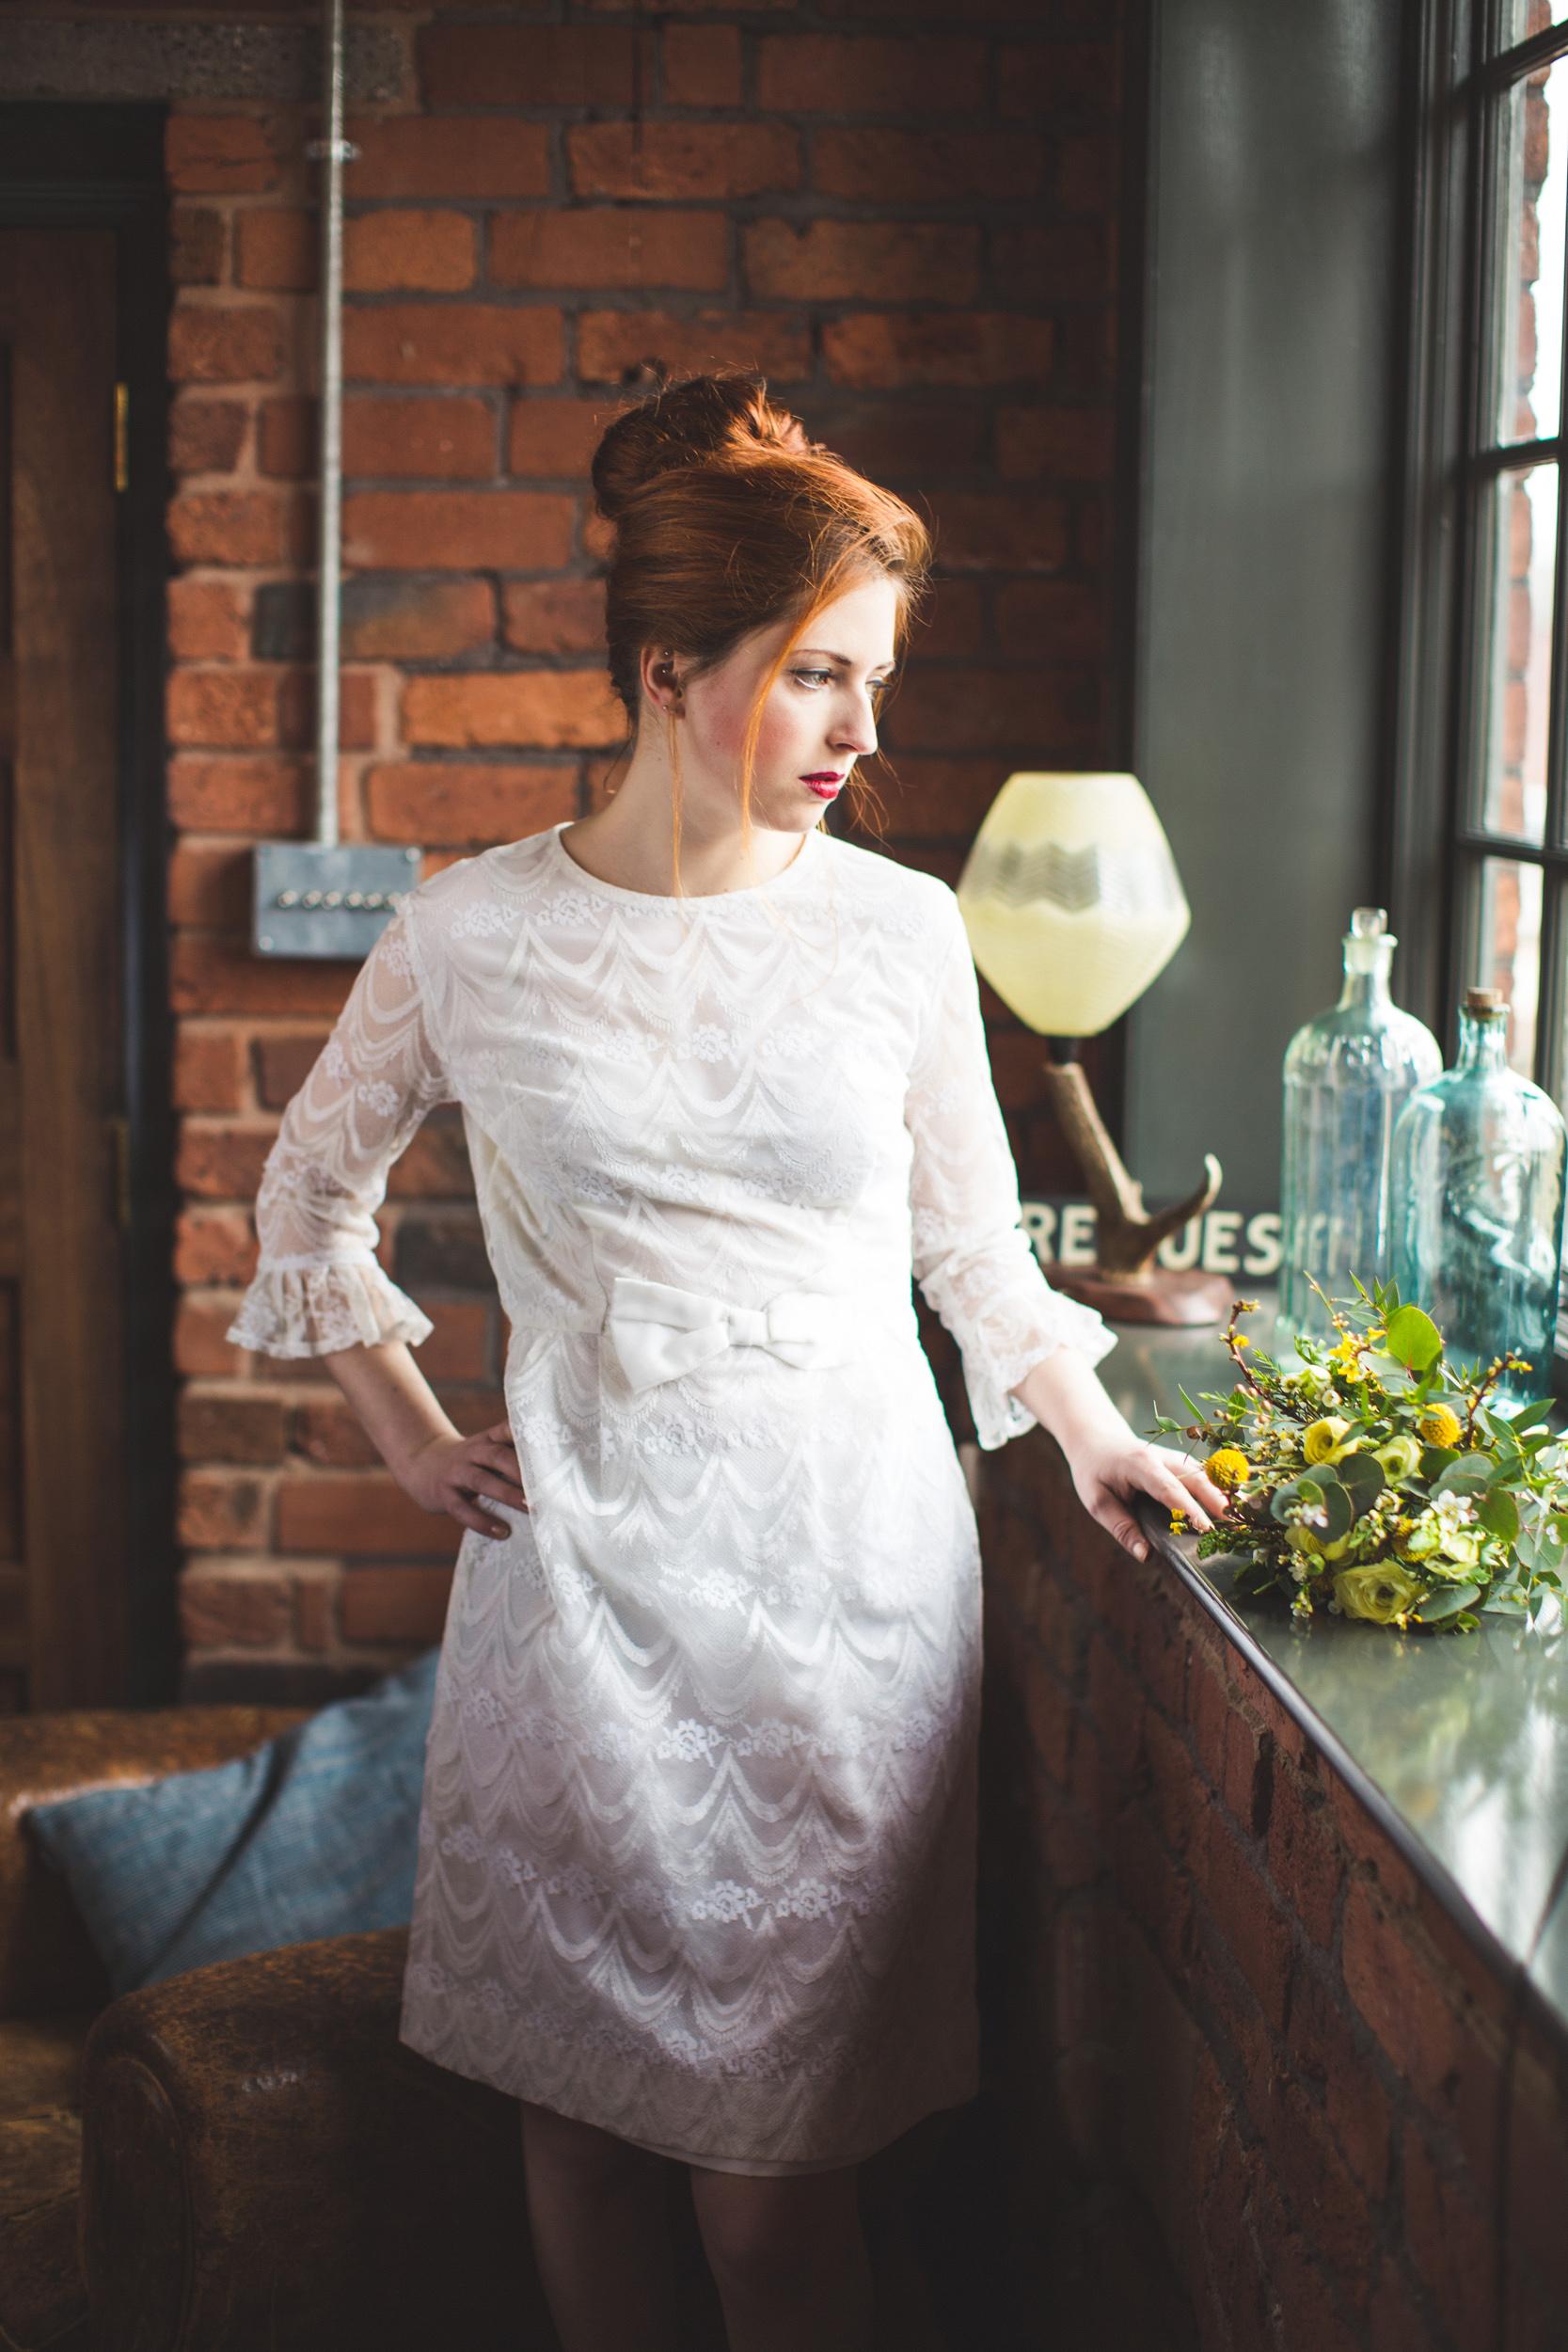 kate-beaumont-vintage-bridal-wedding-dresses-Sheffield-S6-1.jpg